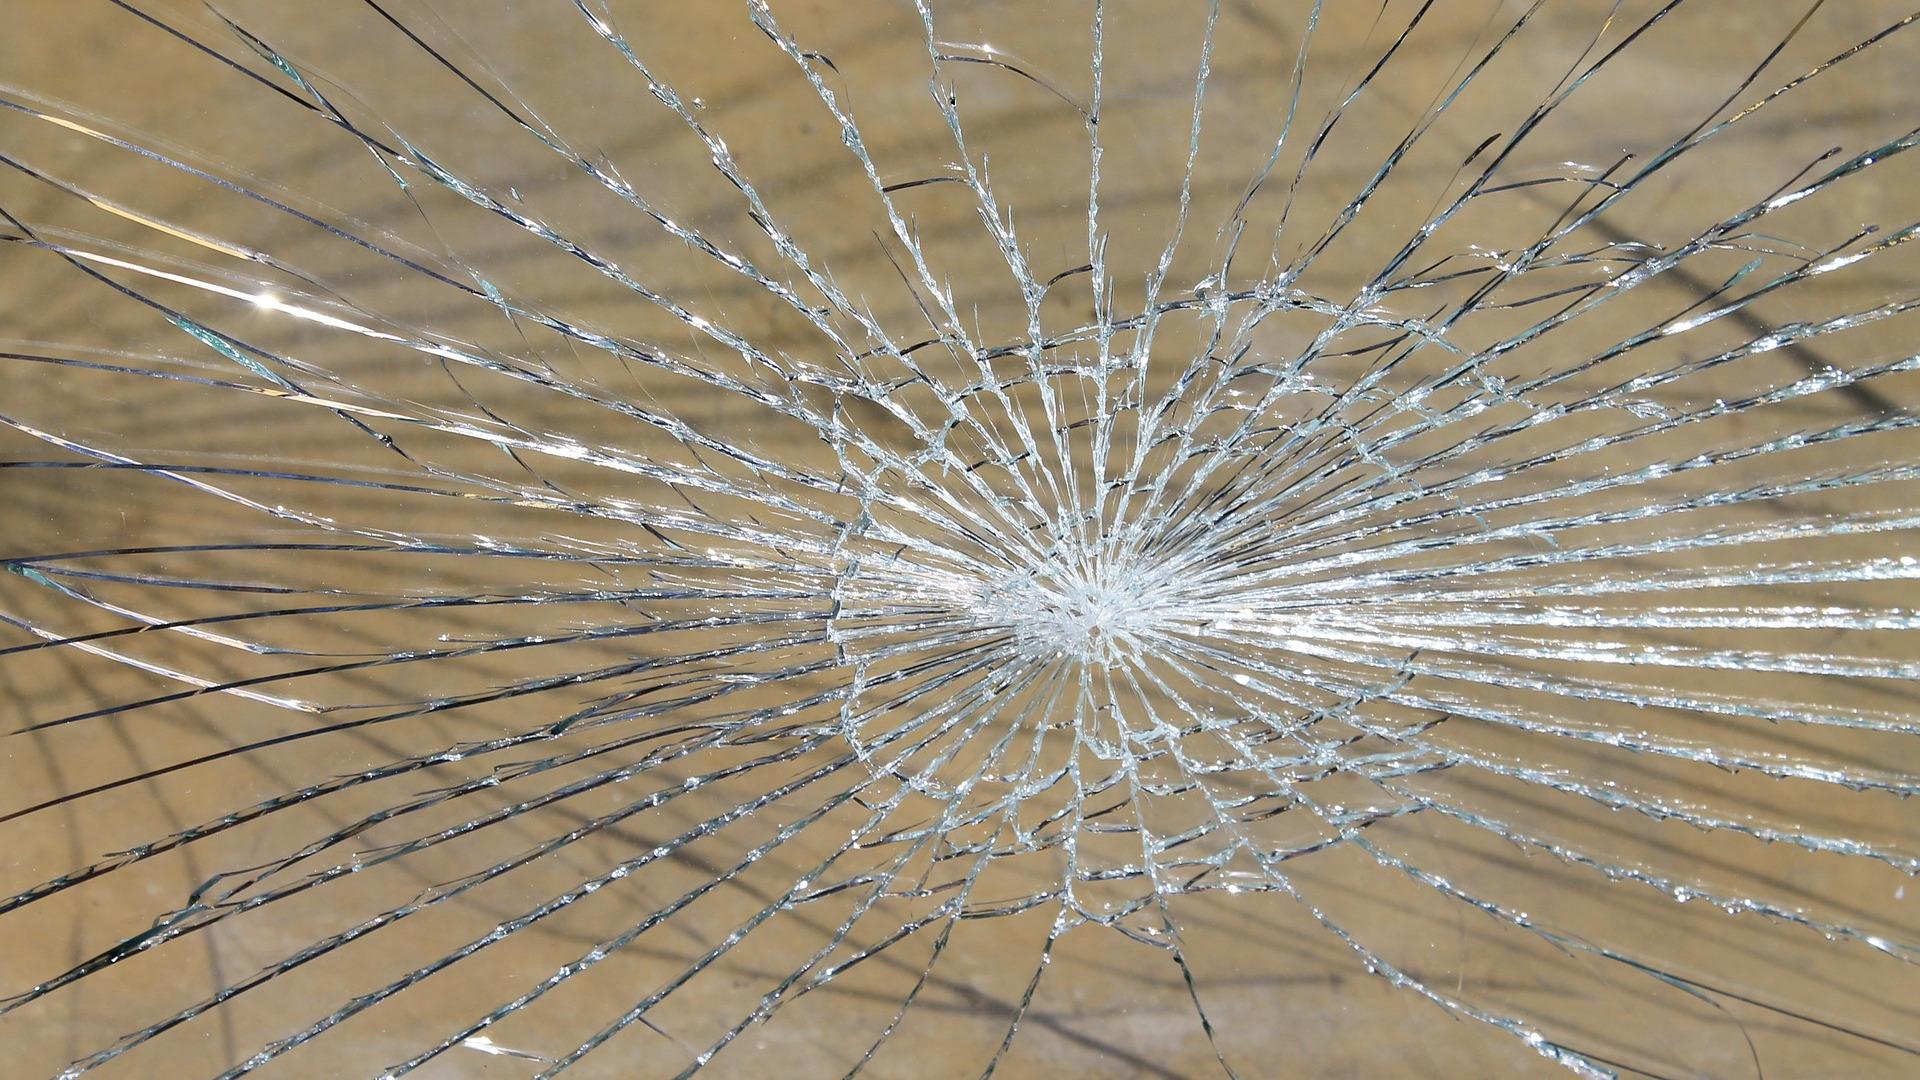 glass-breakage-16_9(Pixabay)